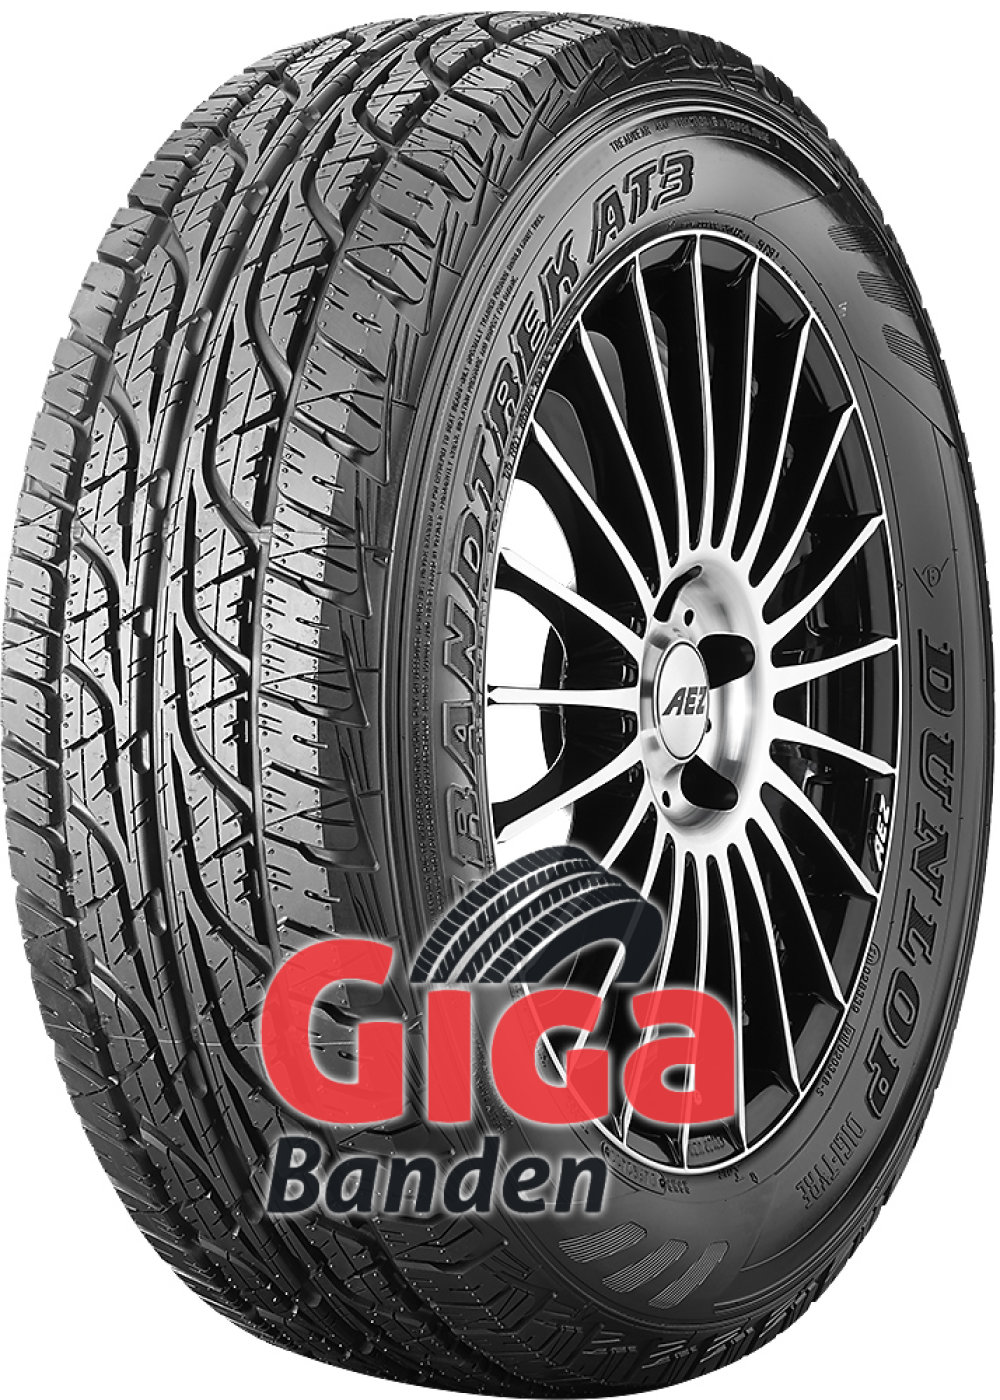 Dunlop Grandtrek AT 3 ( 205/70 R15 96T )